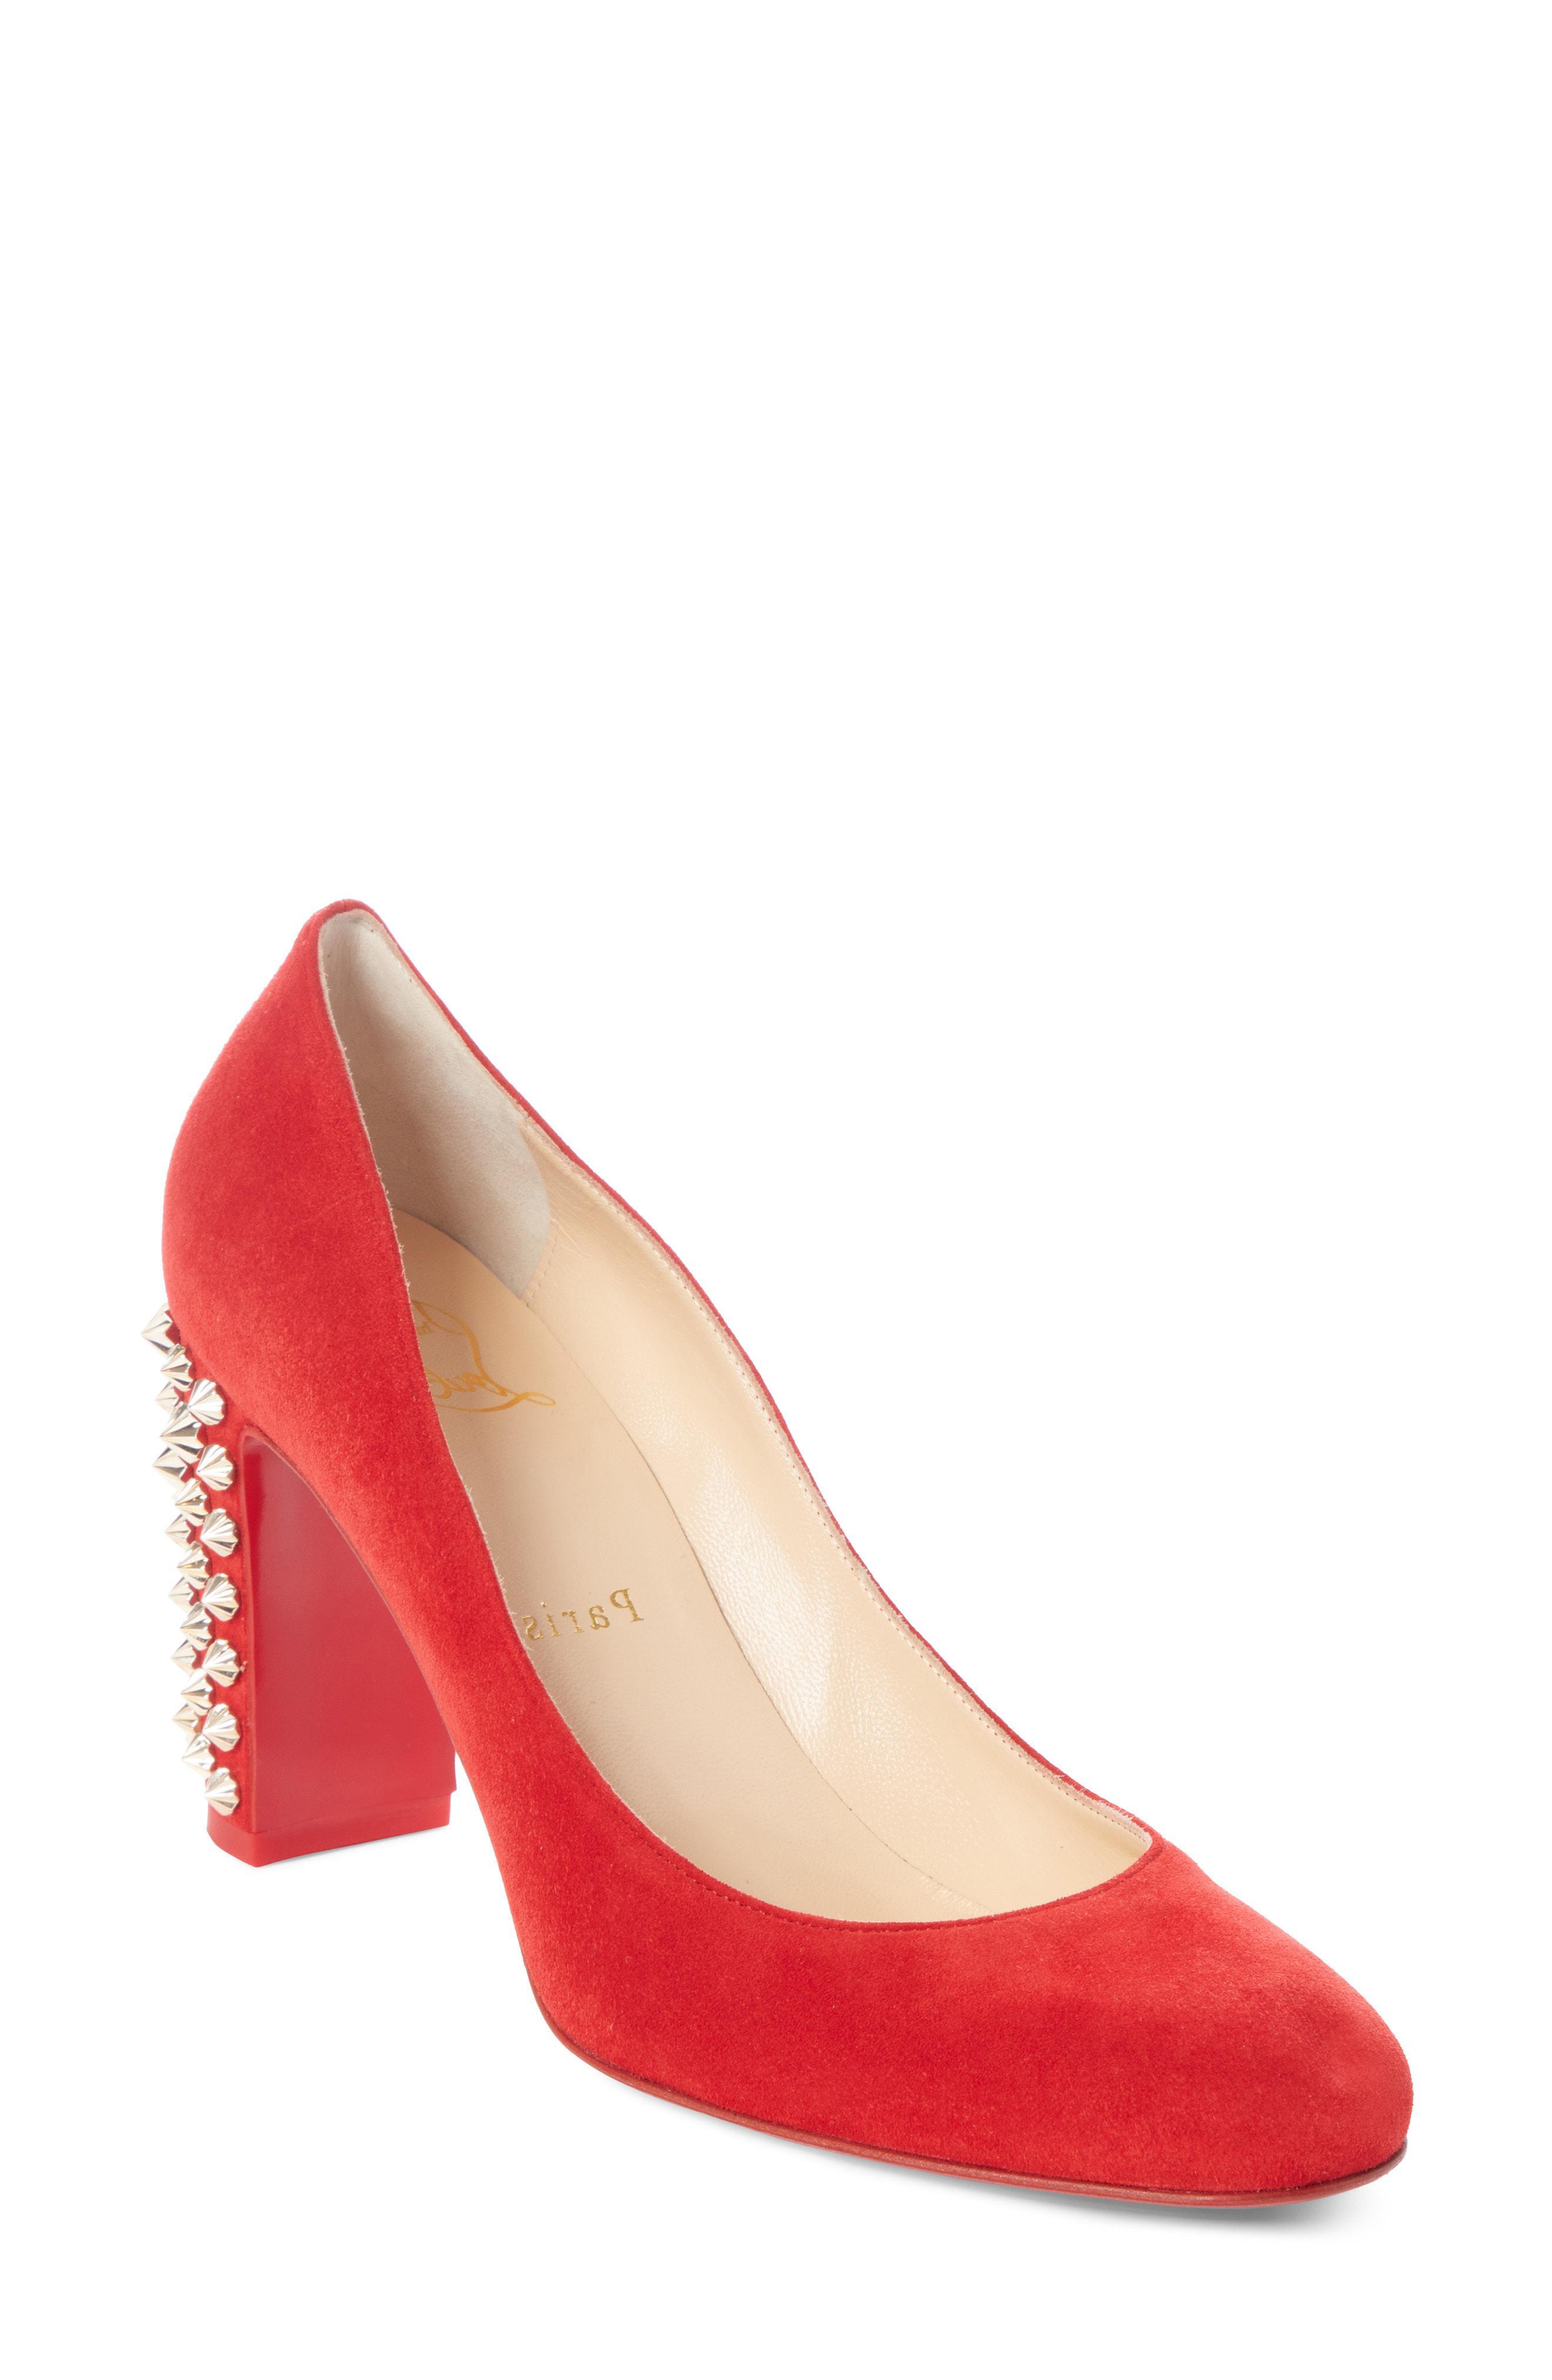 4571492f4bd Lyst - Christian Louboutin Marimalus Spike Heel Pump in Red